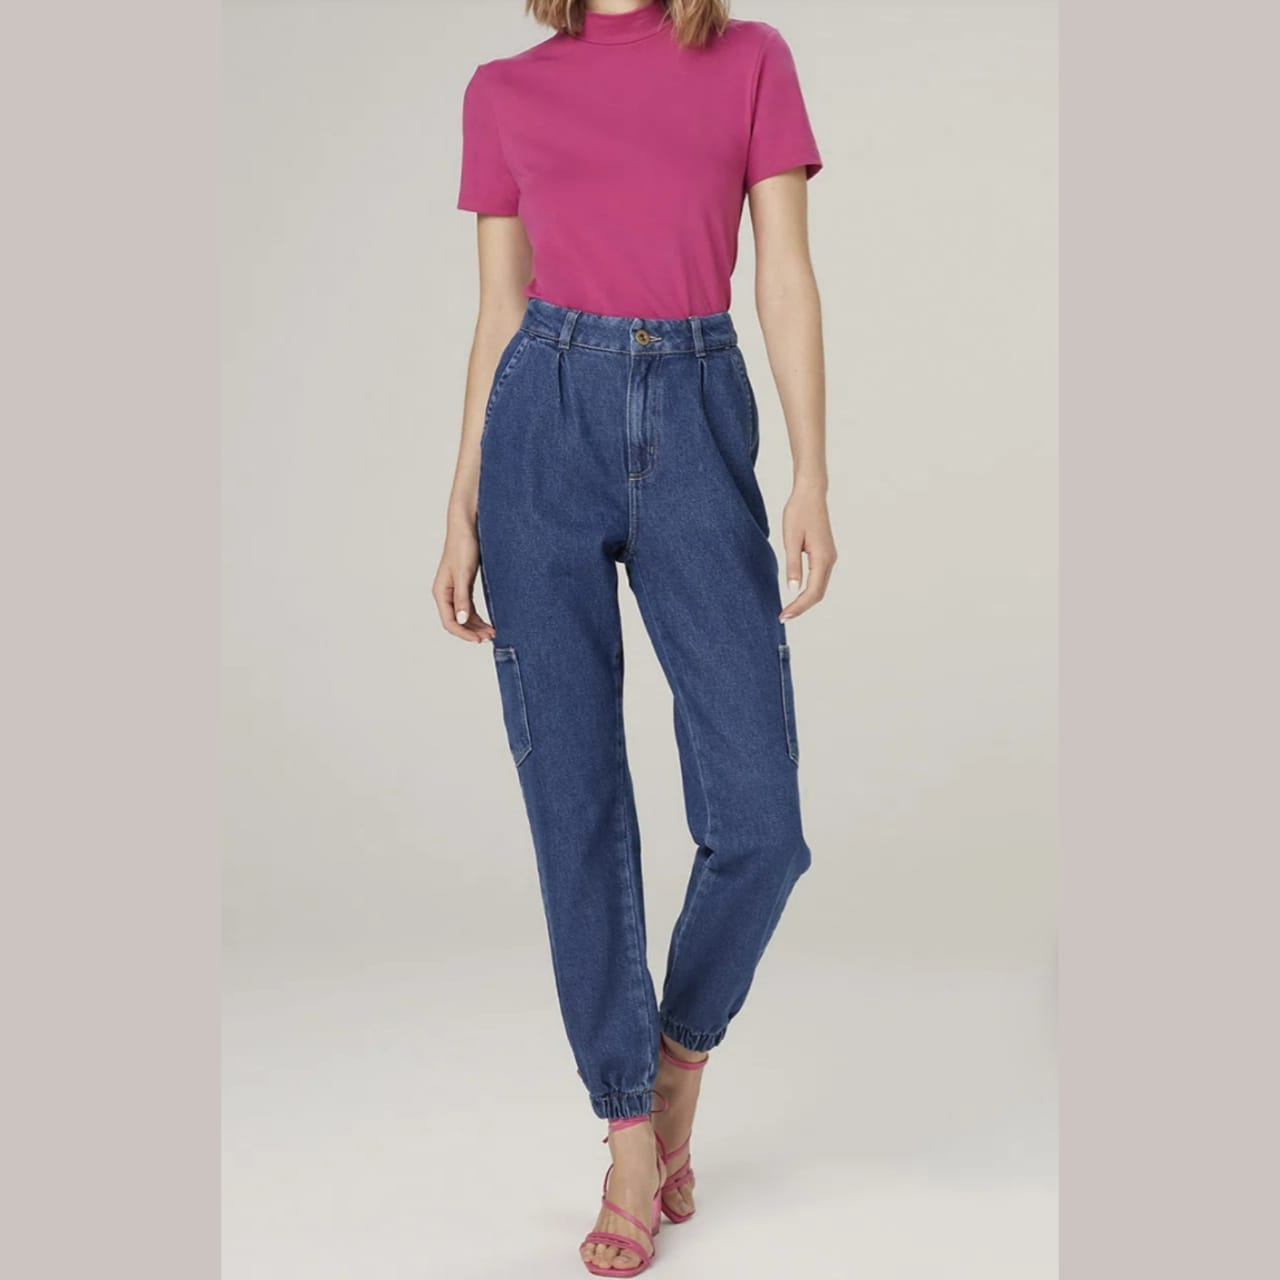 Calca Jeans  Elastico Barra Dzarm